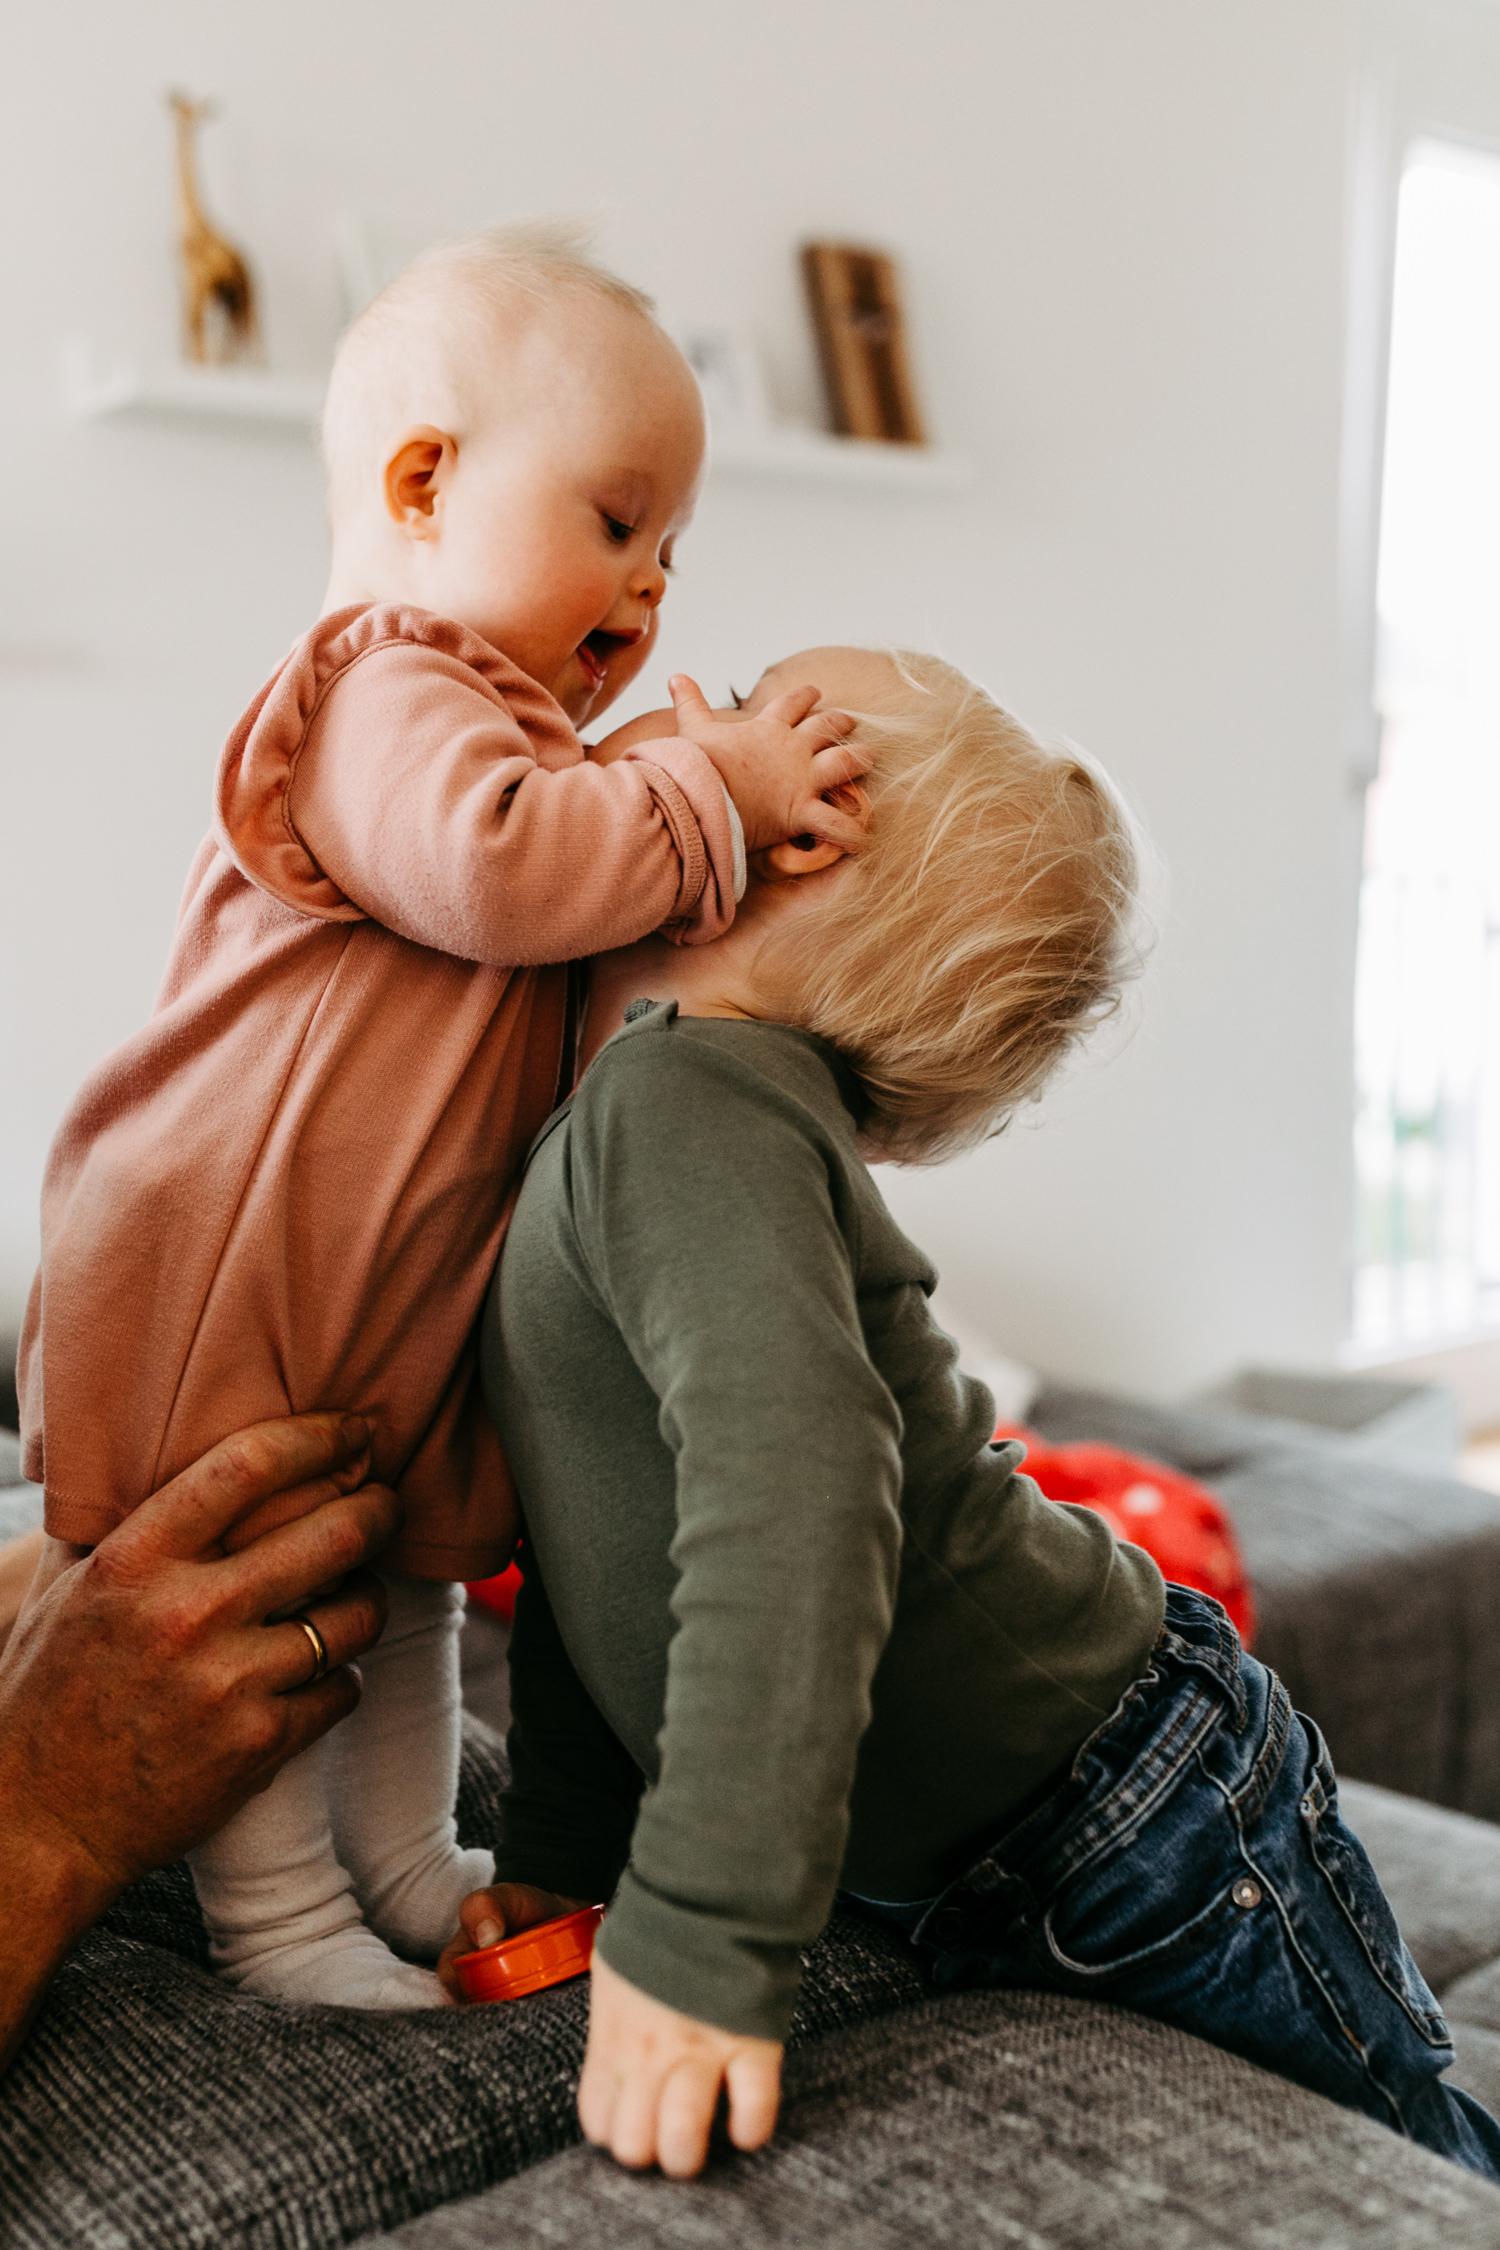 Familienreportage Homestory Familienfotograf Hamburg Lübeck Lüneburg Bremen Kiel Alltagsfotografie Familienfotos Zuhause Trisomie 21 Handicap Geschwister Familienalltag Down-Syndrom